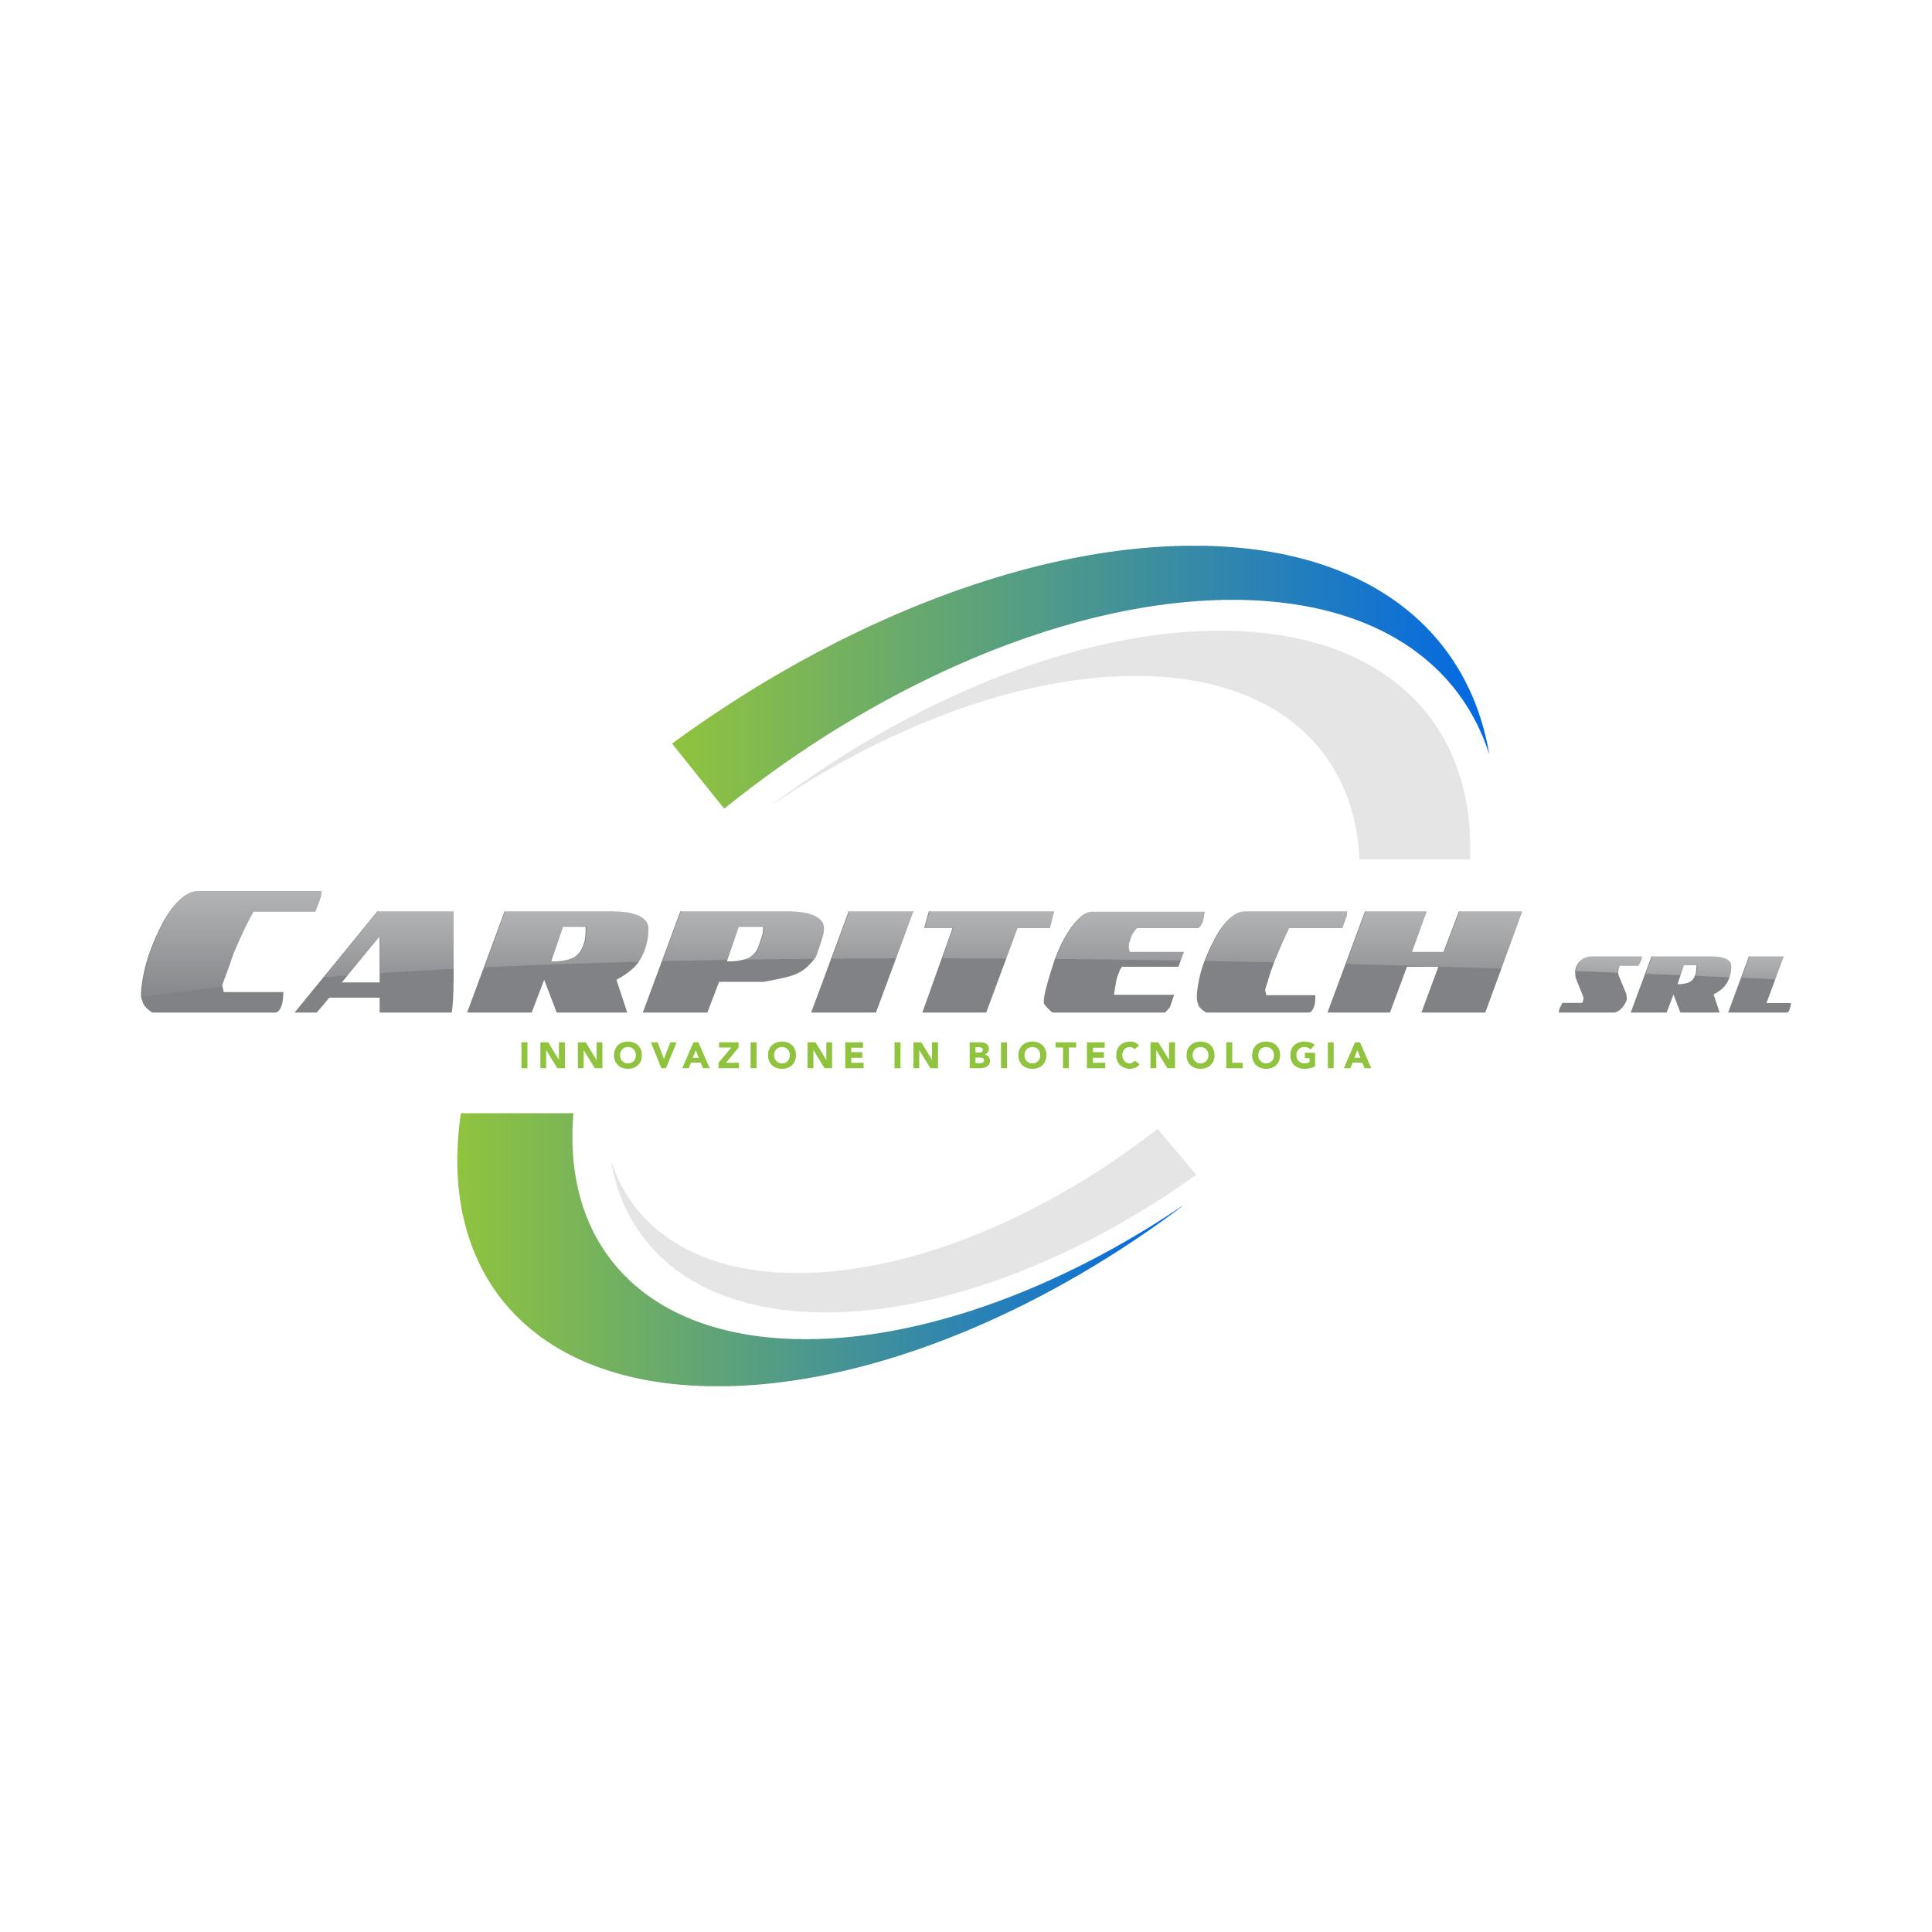 Carpitech